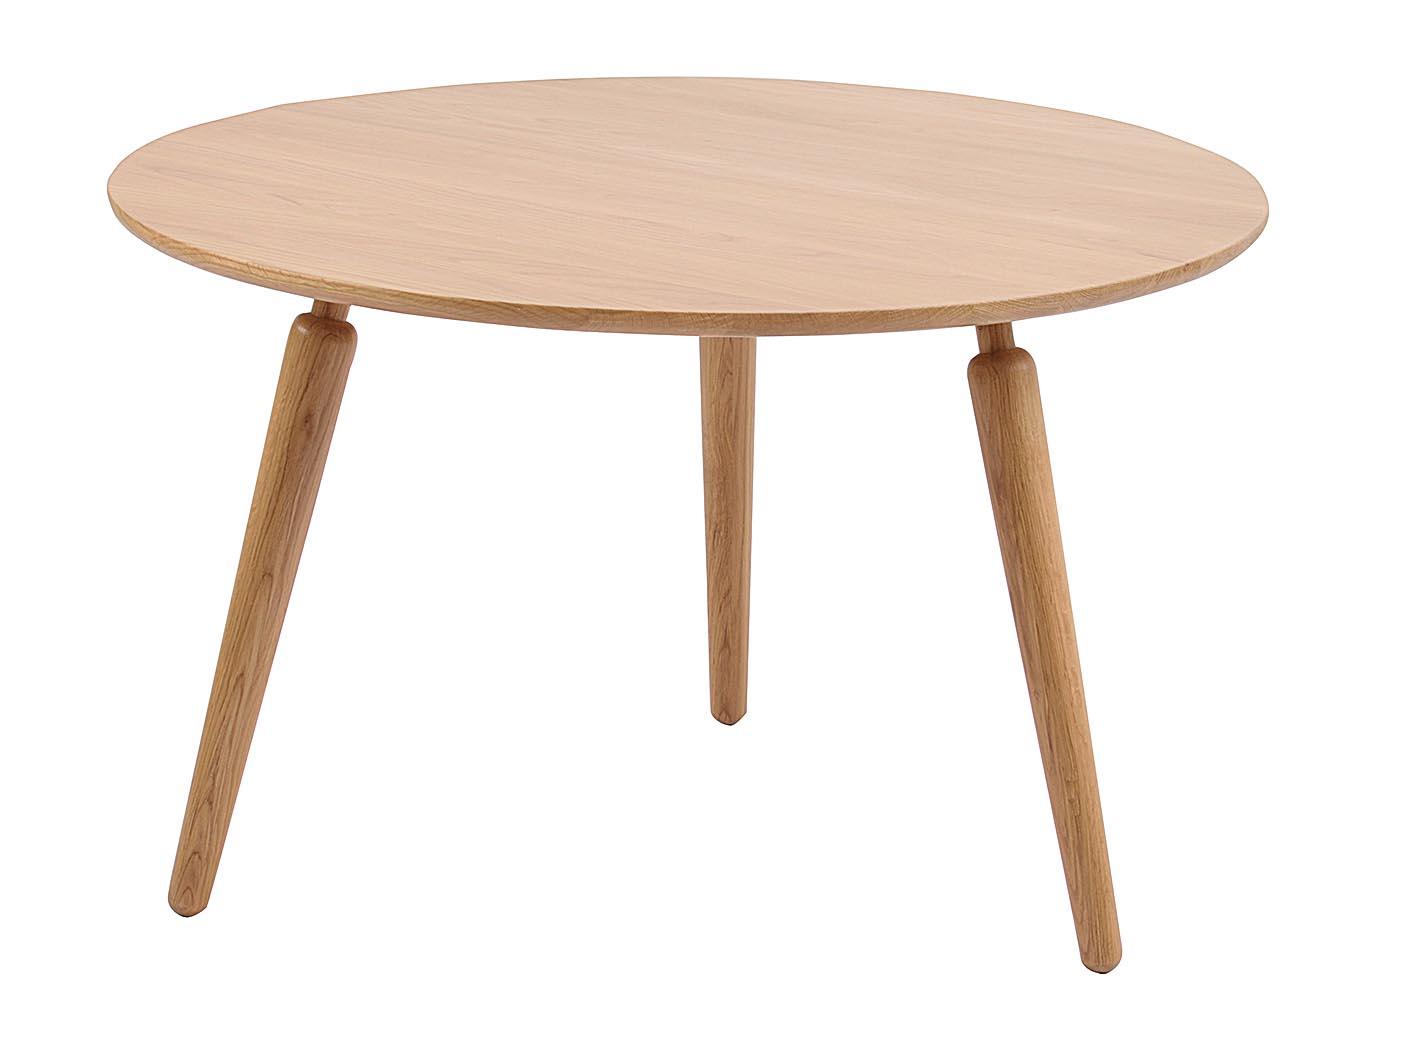 Image of   Cappuccino sofabord - massiv eg (Ø80)